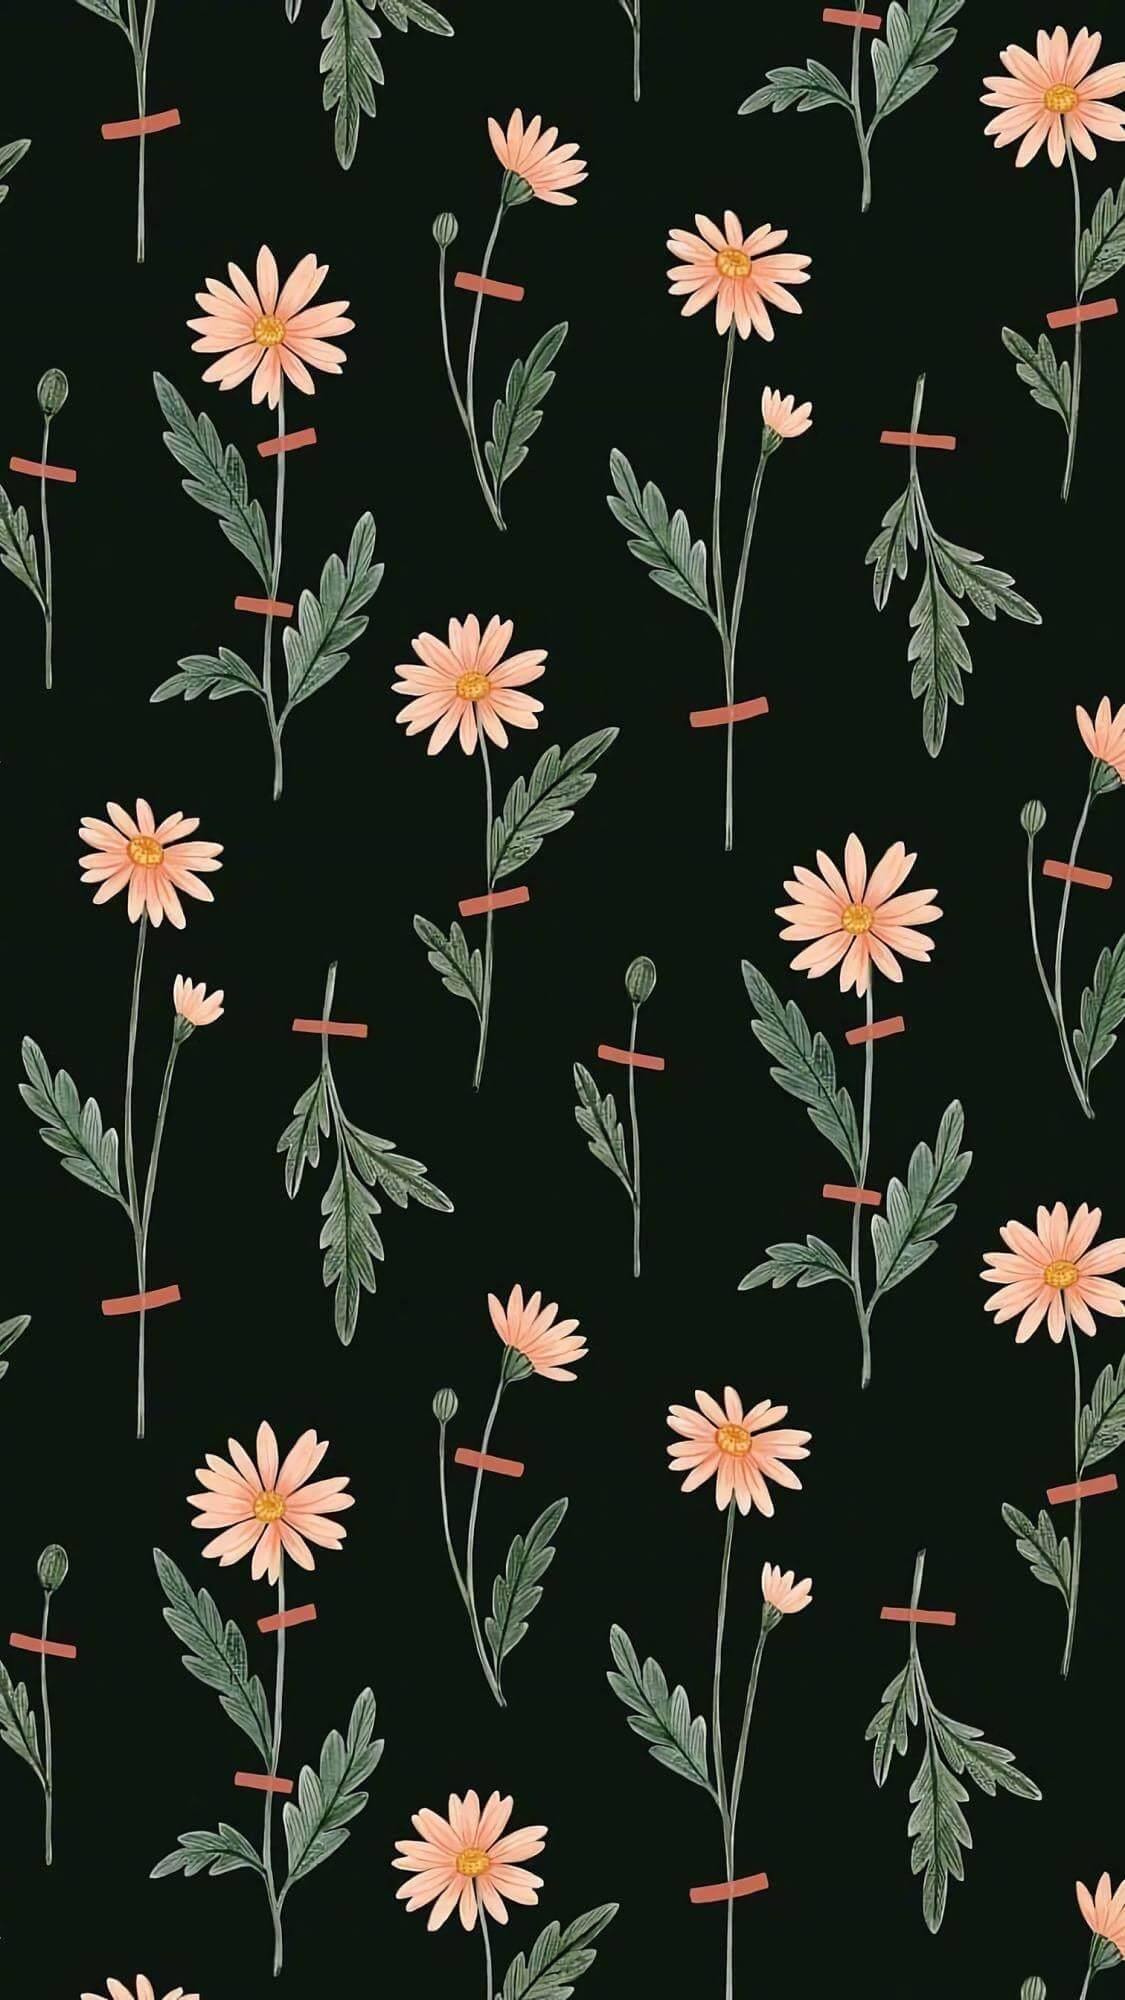 Elegant flowers HD phone wallpaper